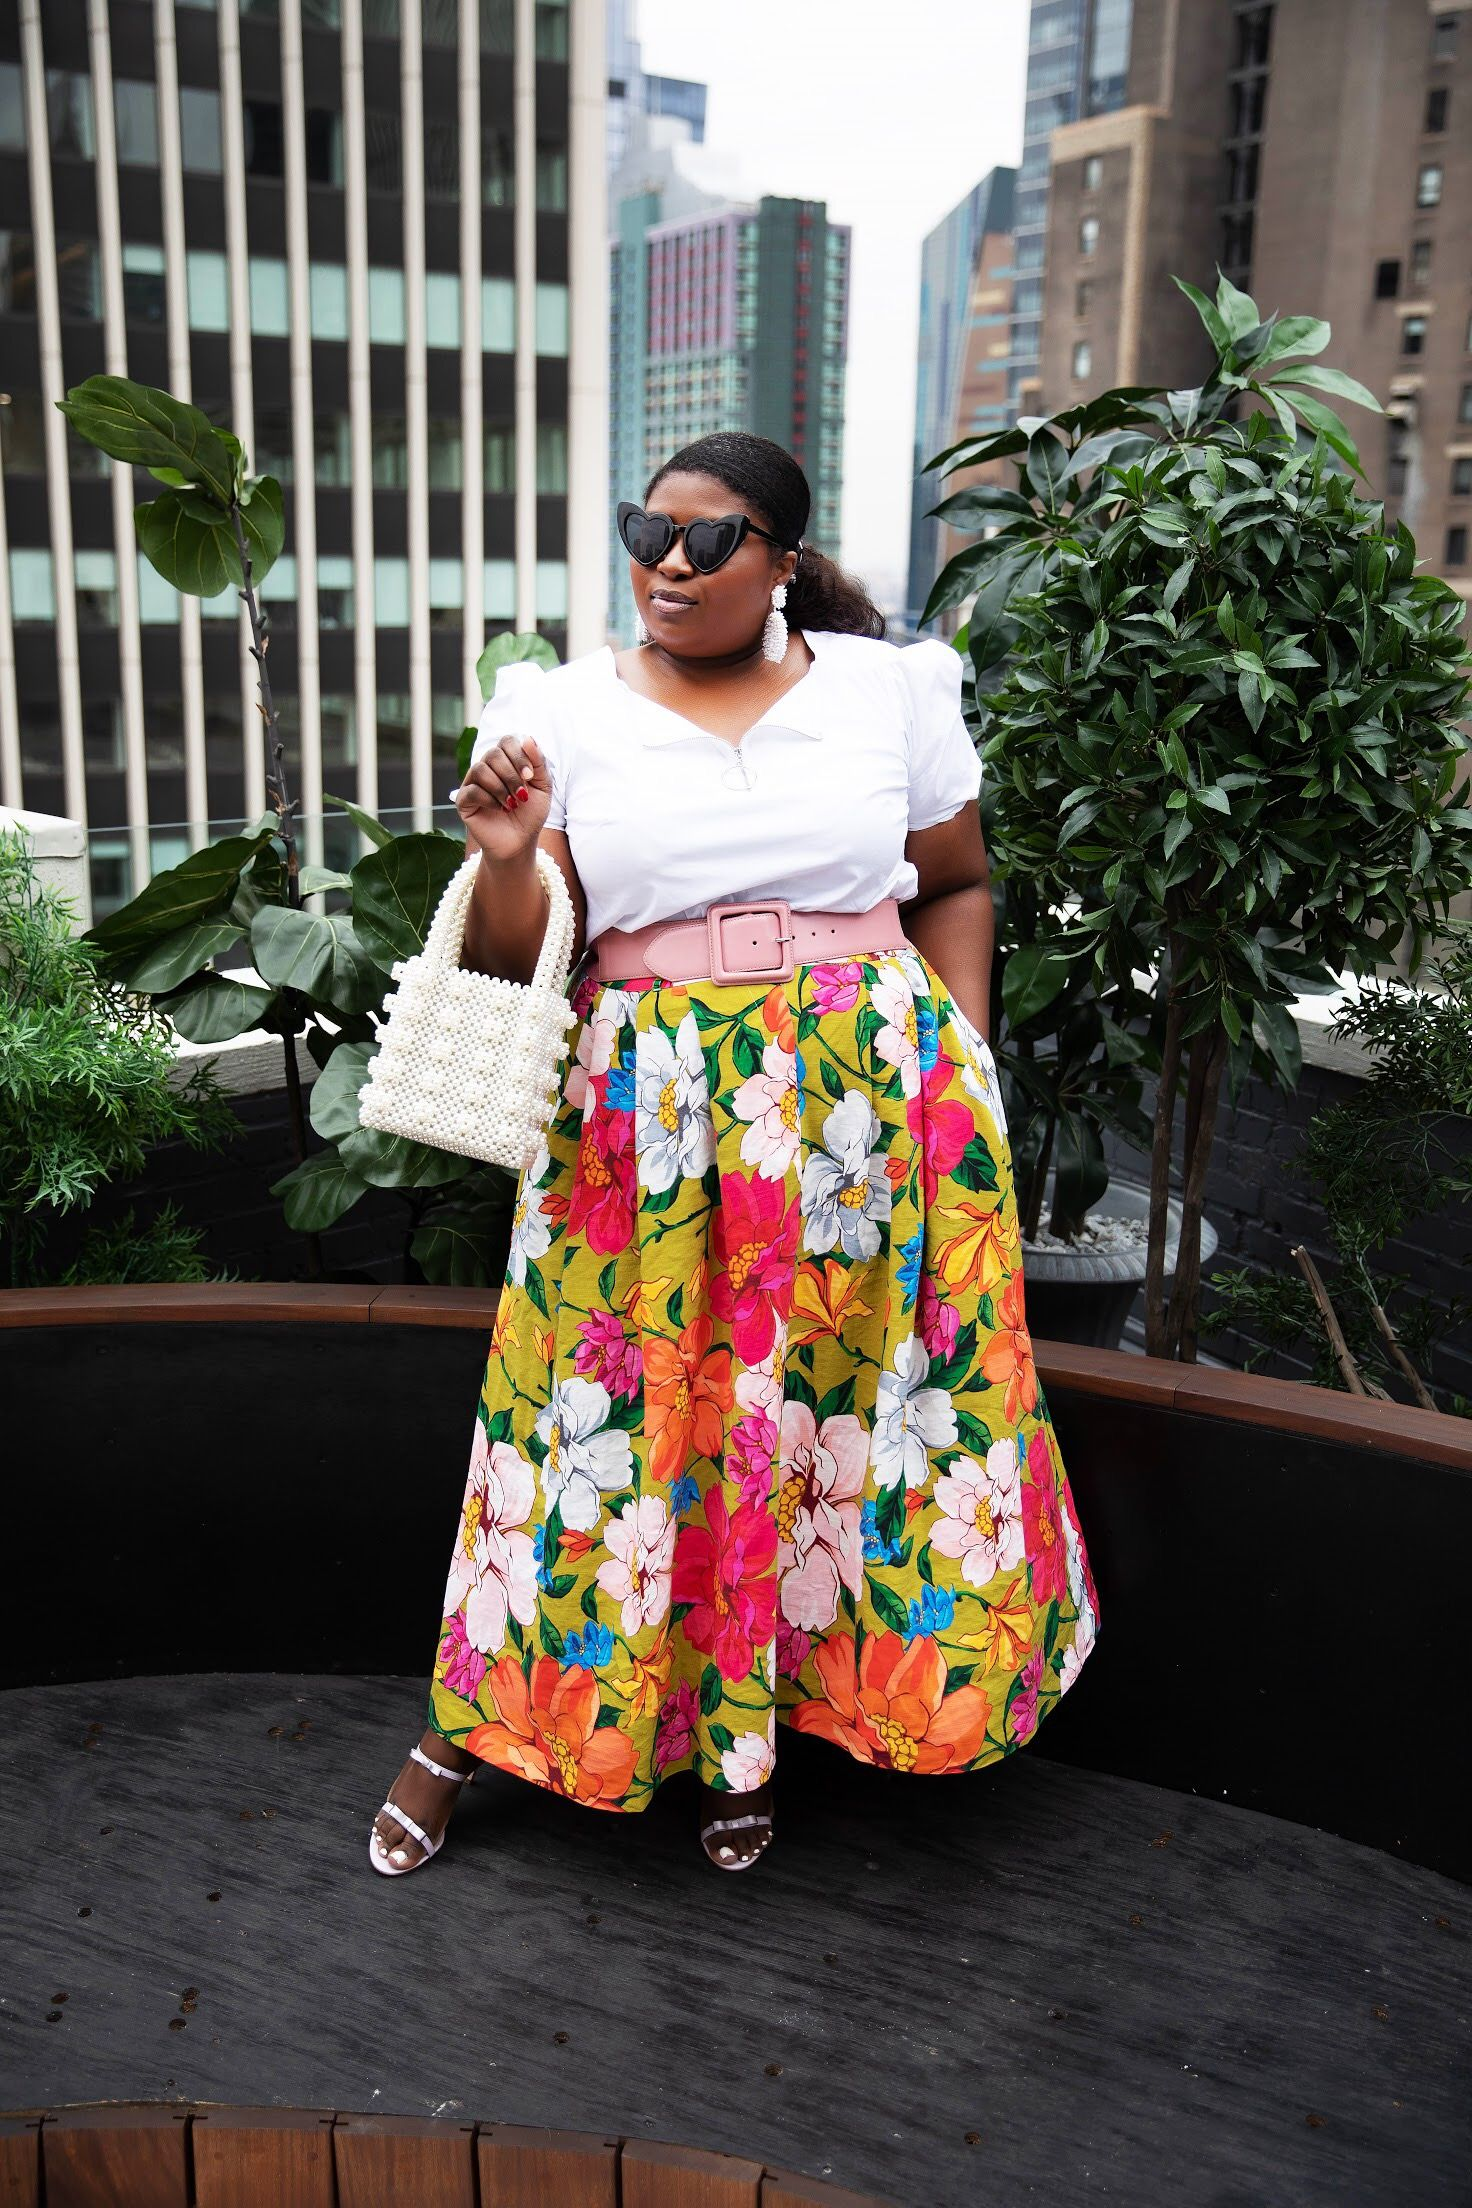 b21c177d50da The Floral Skirt Modernized for Spring | My Style in 2019 | Skirts ...